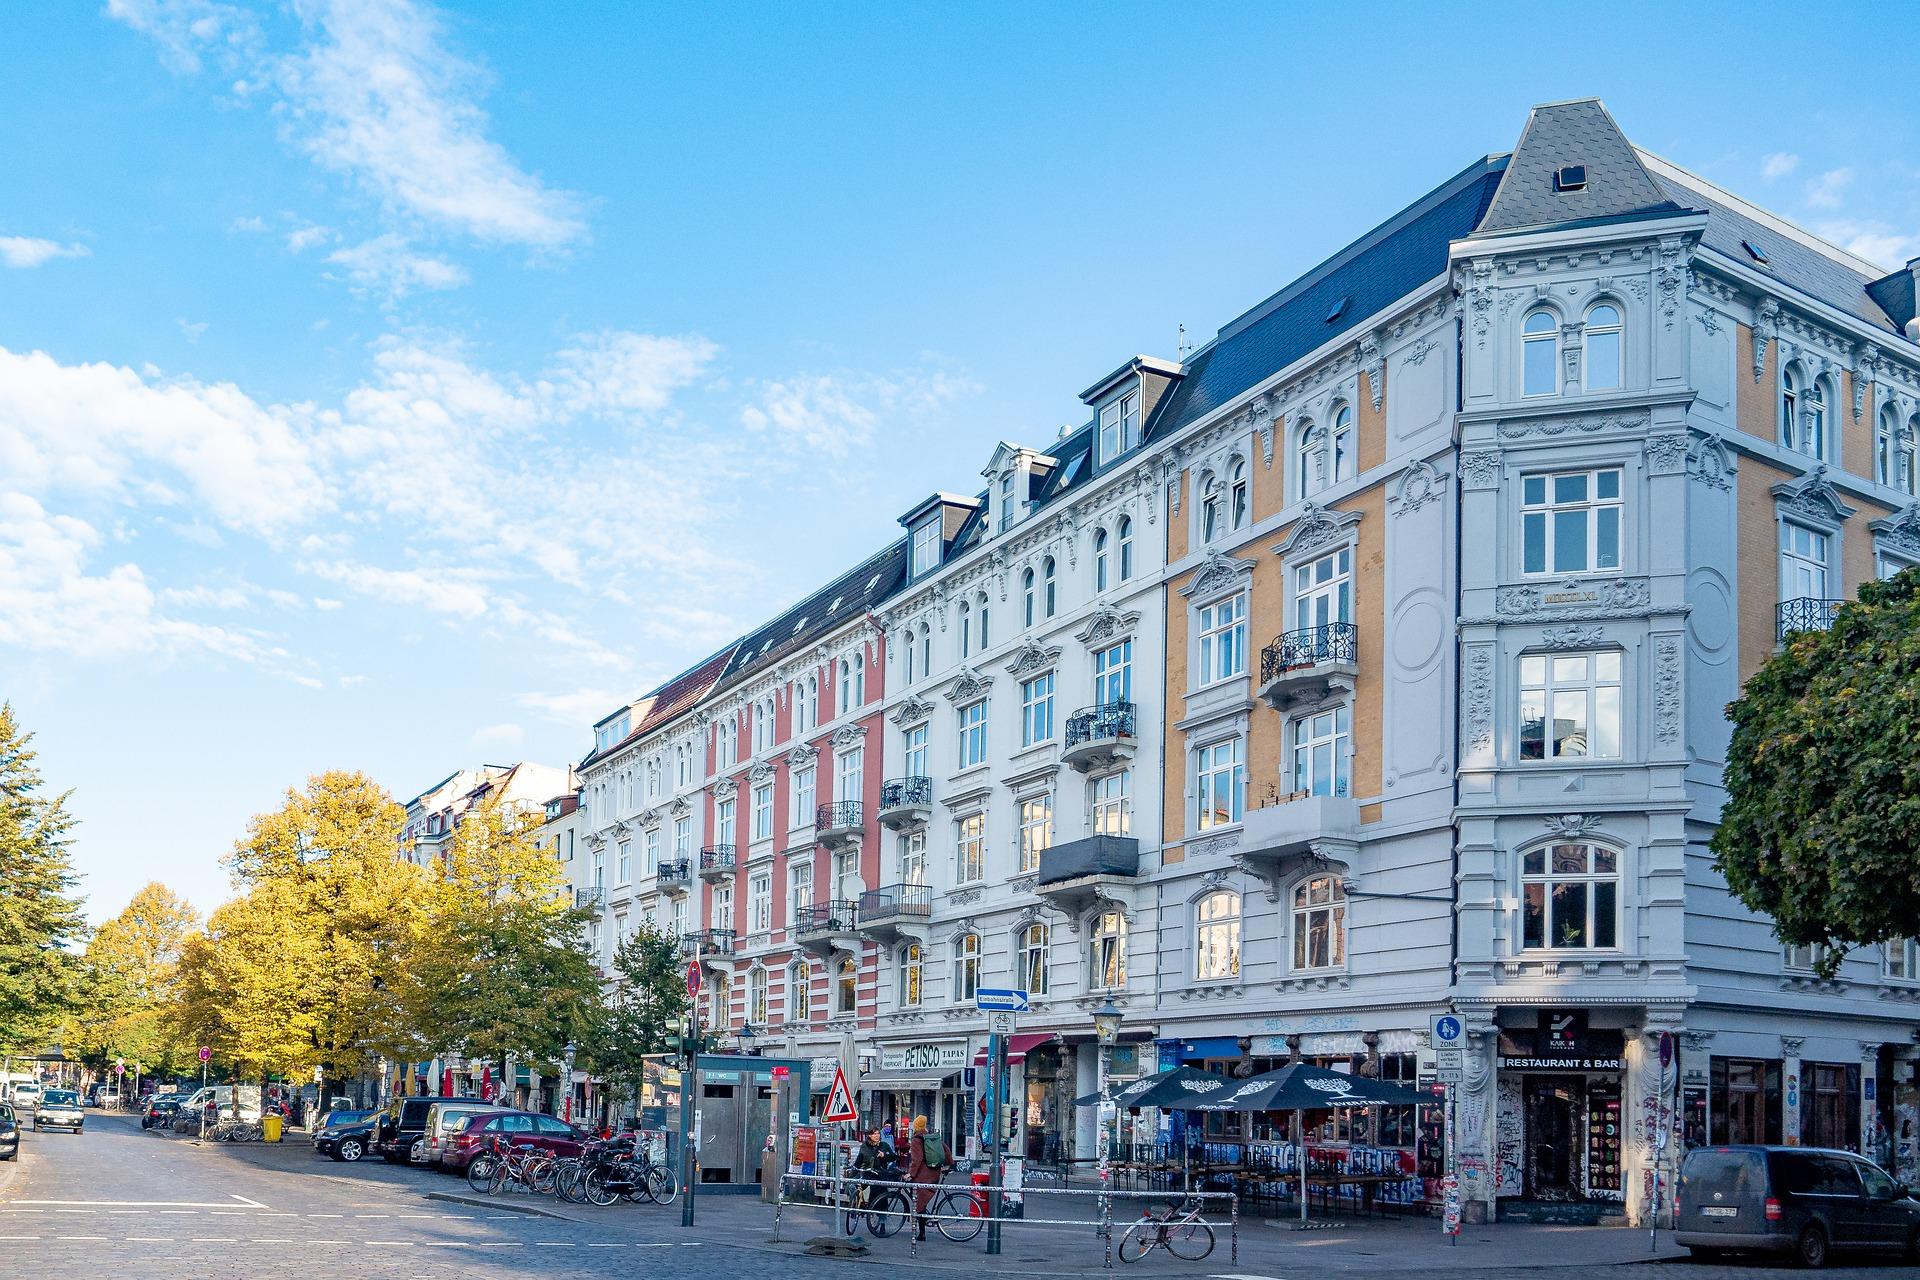 Wunderschöne Immobilie in 30159 Hannover